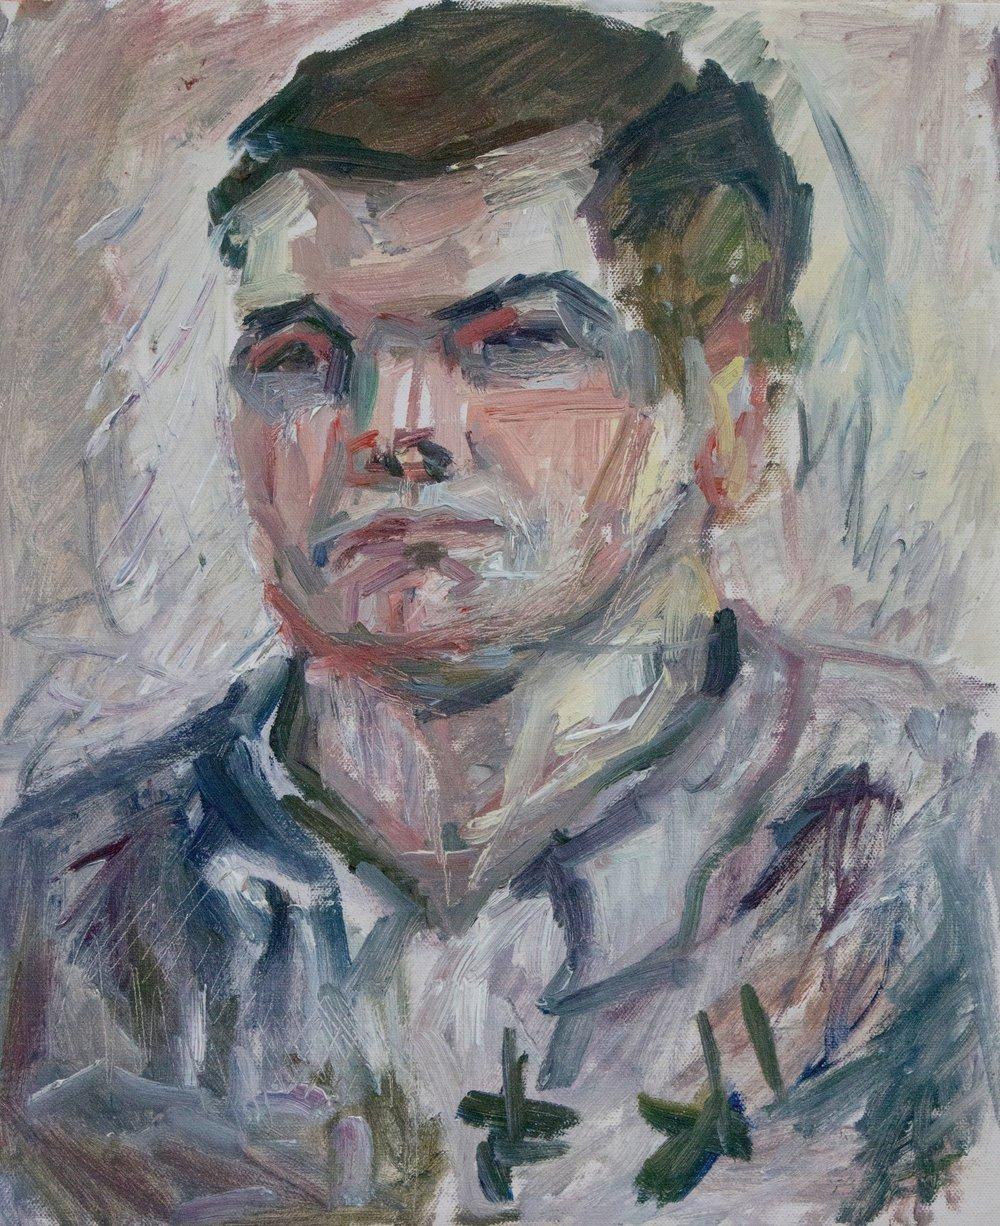 "Patrick , oil on canvas, 18"" x 15"", 2018"